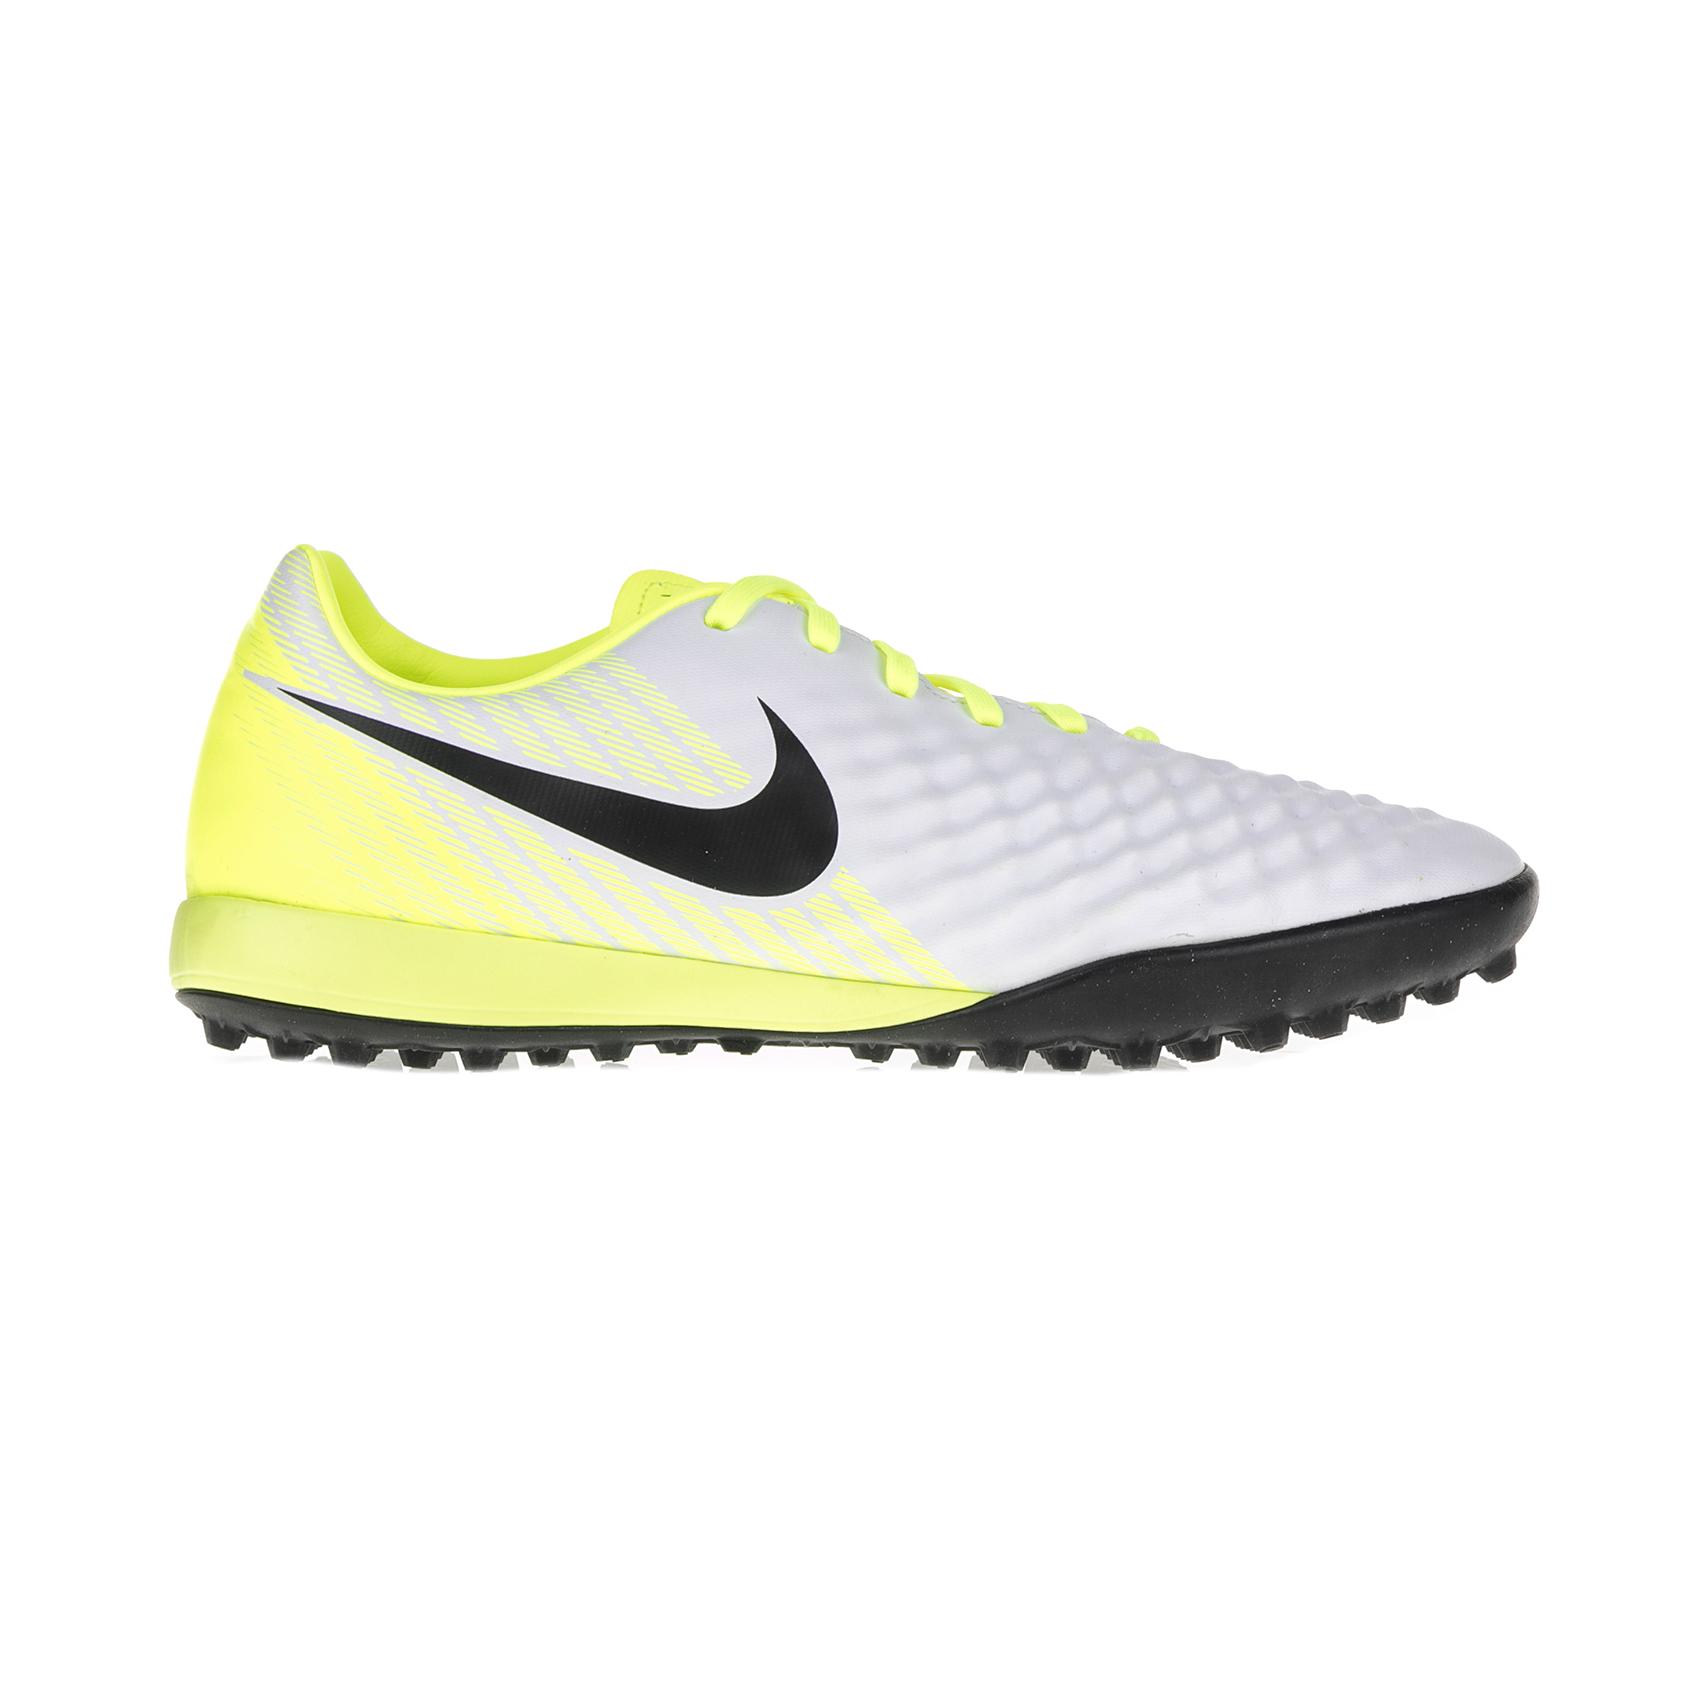 NIKE – Ανδρικά ποδοσφαιρικά παπούτσια Nike MAGISTAX ONDA II TF λευκά – κίτρινα